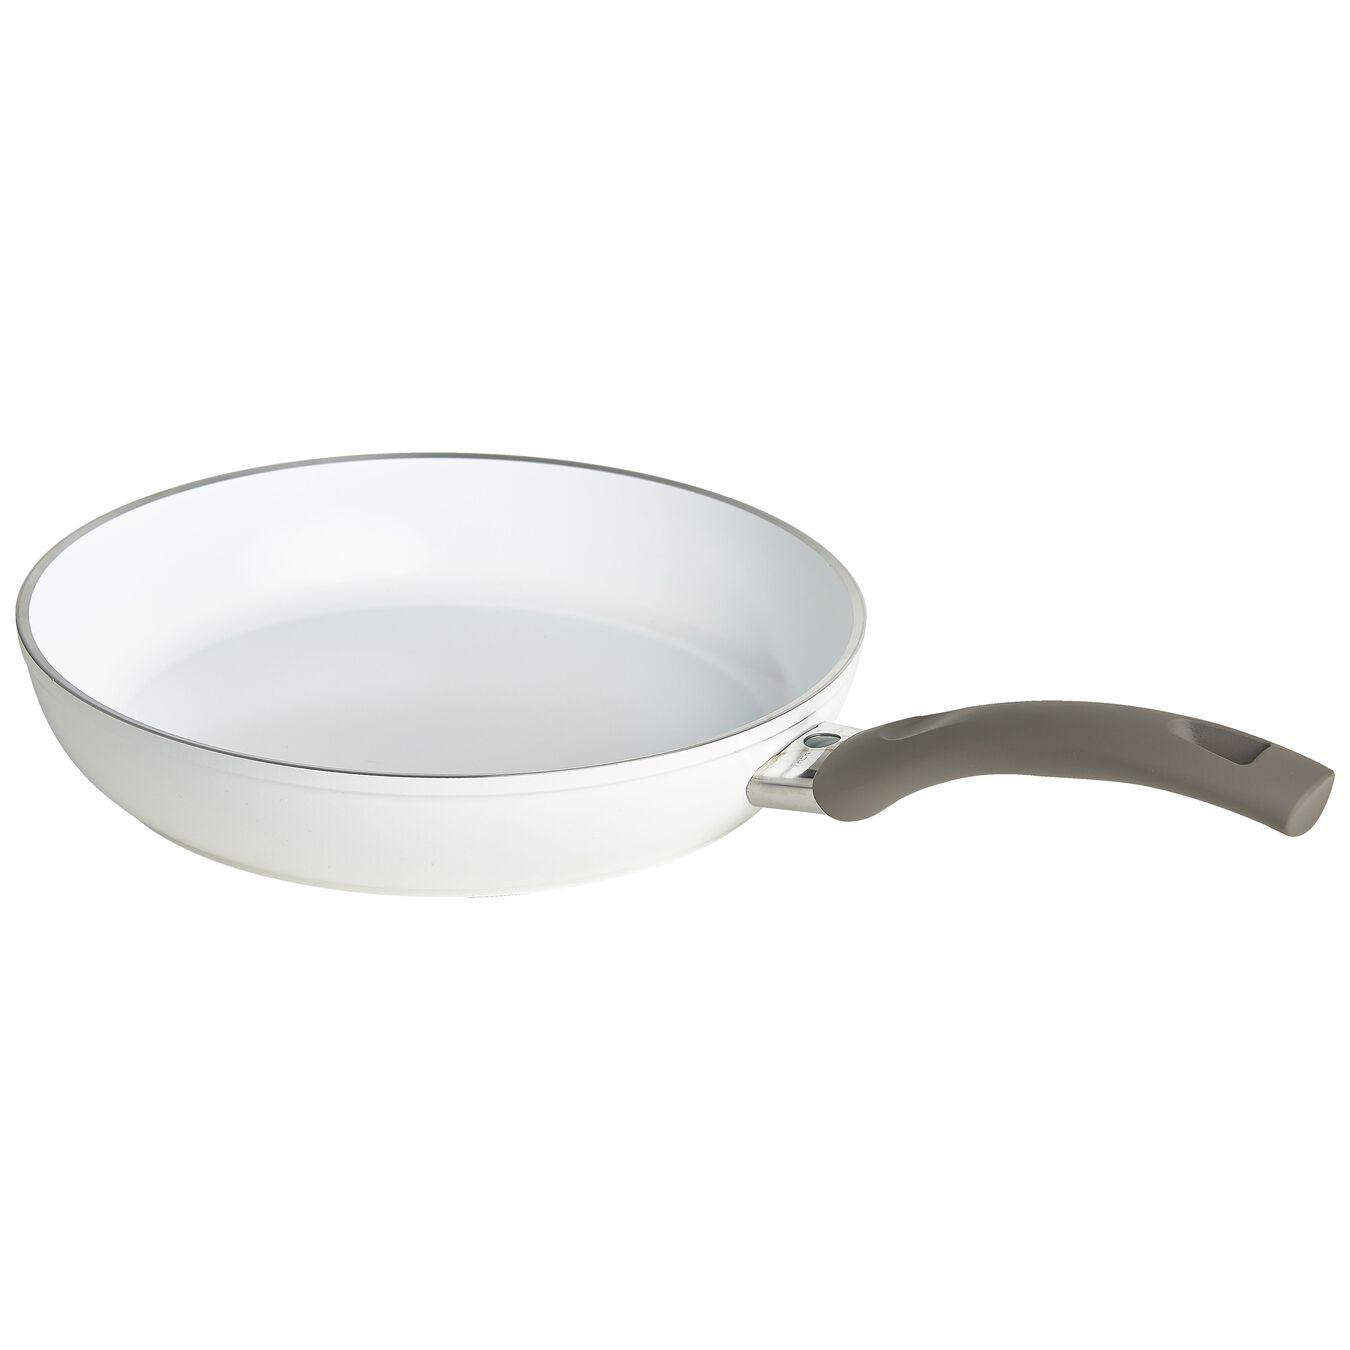 Poêle basse 24 cm, Aluminium, Blanc,,large 1